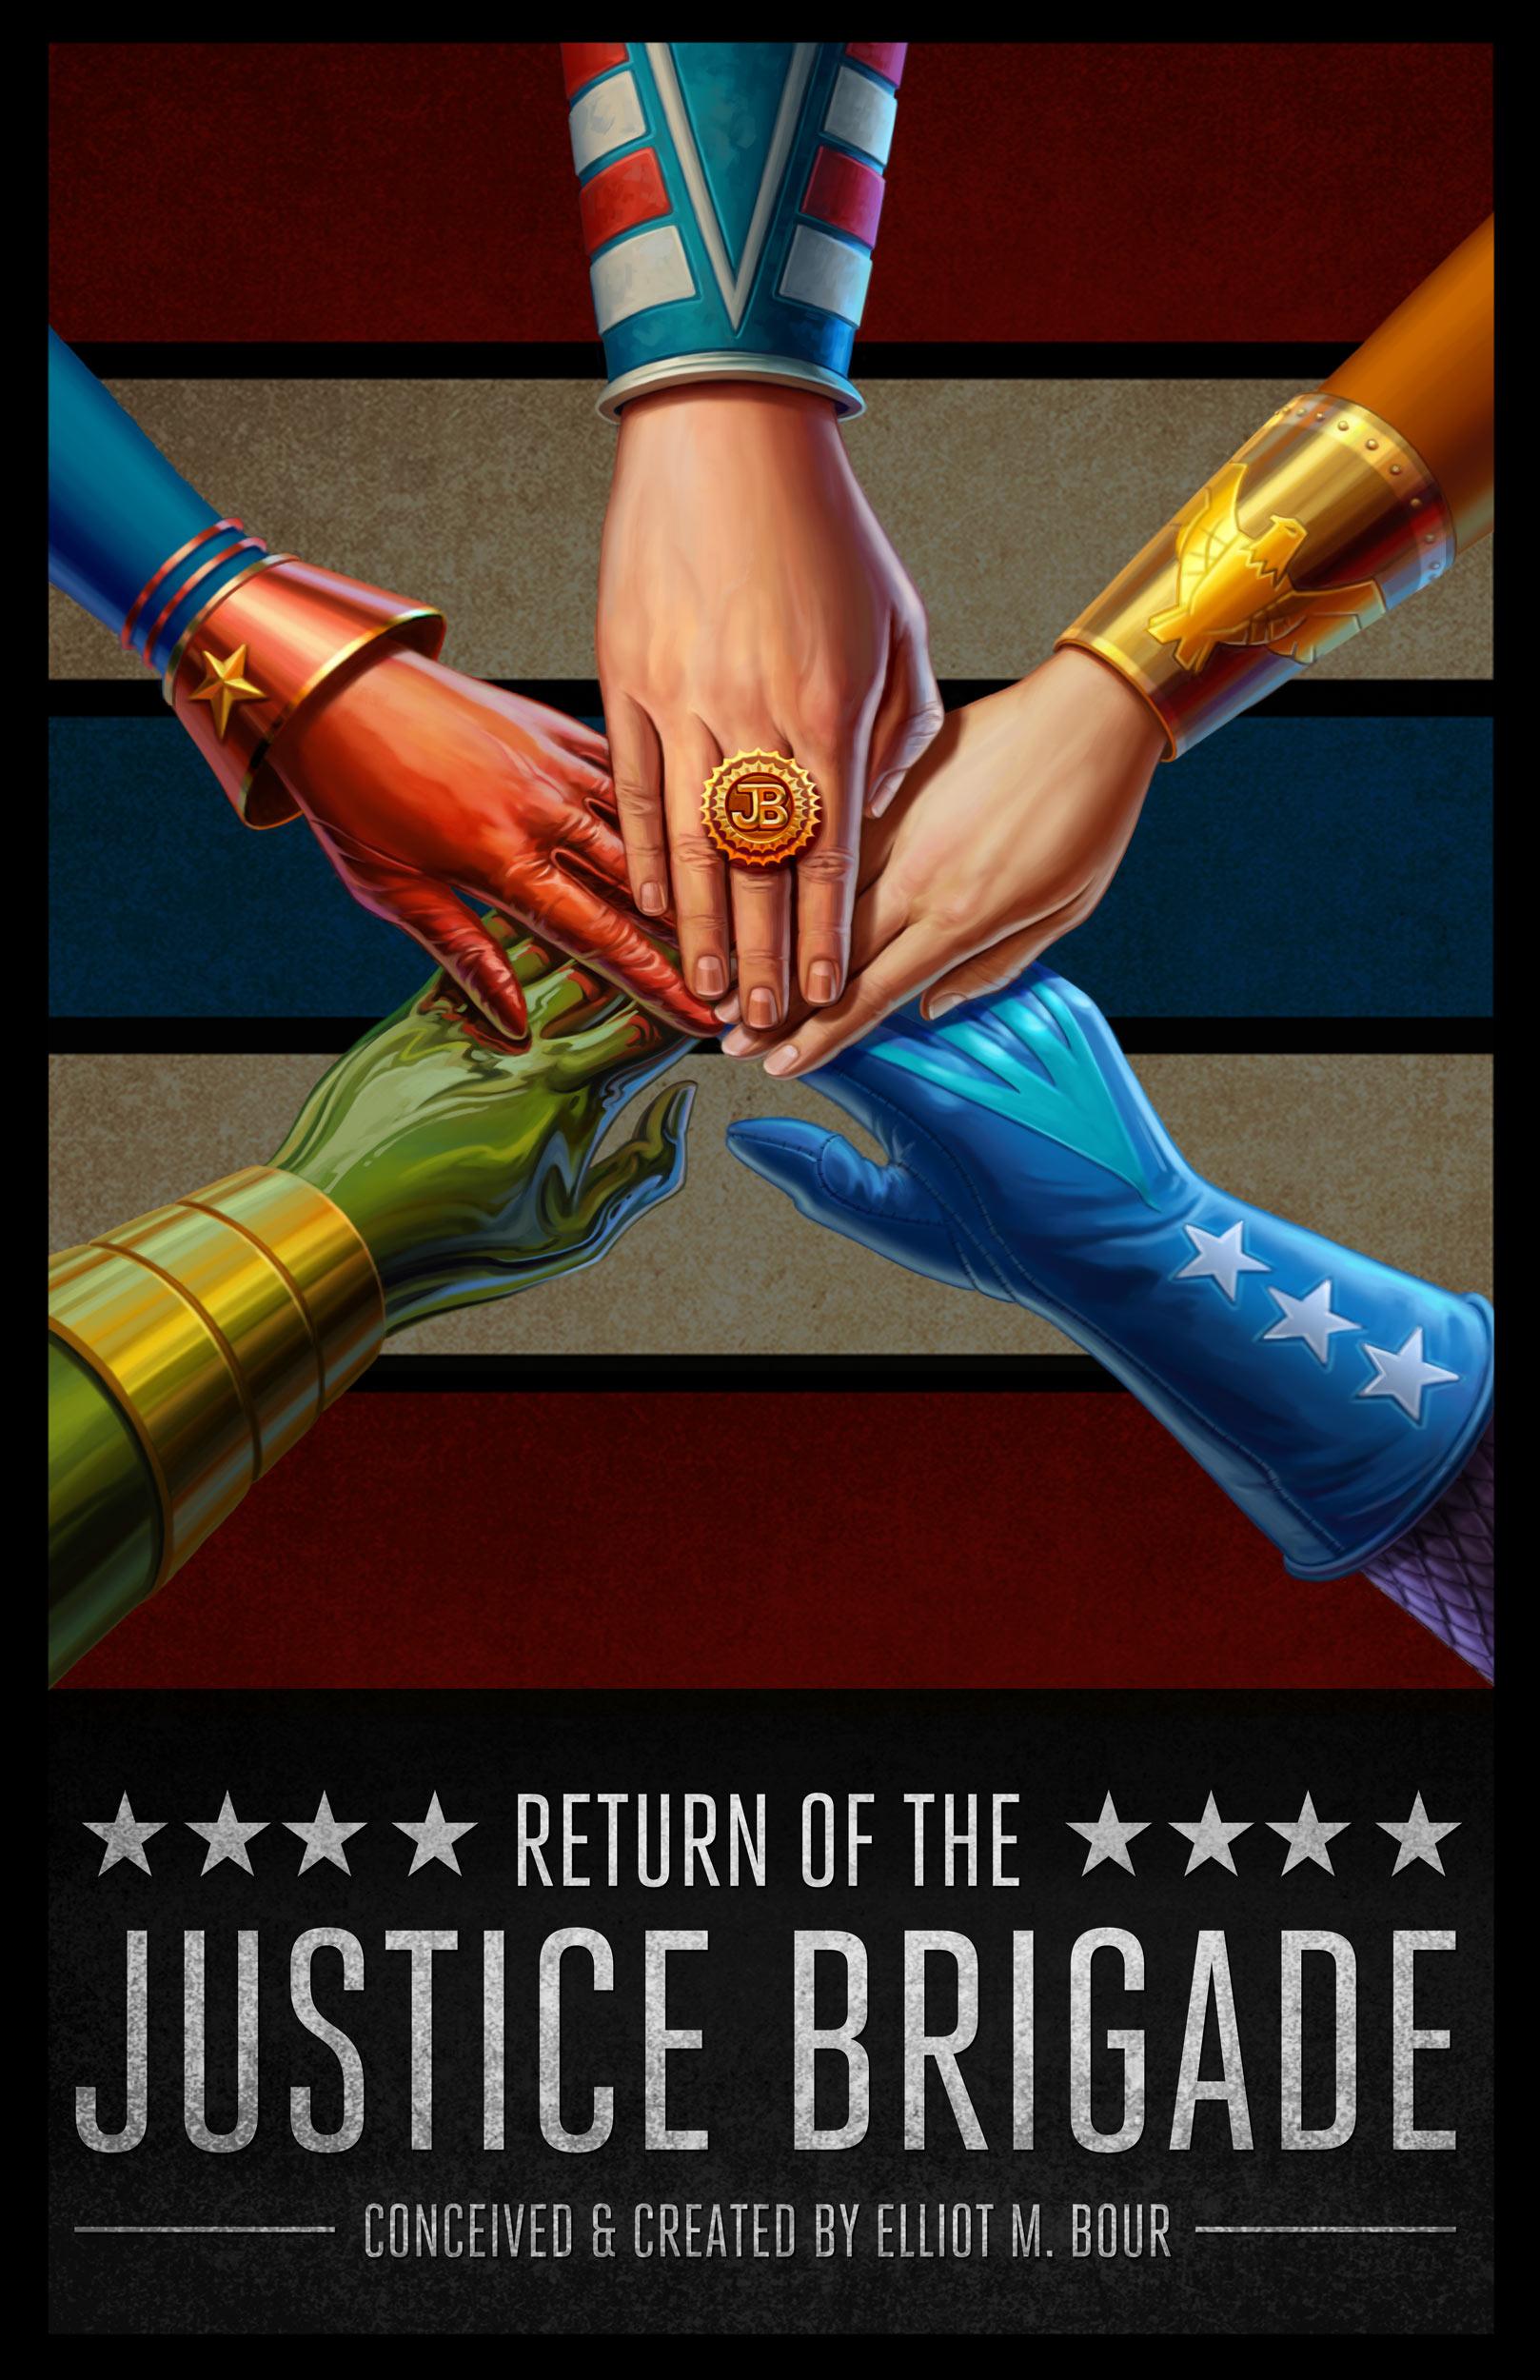 Justice-Brigade-Poster.jpg